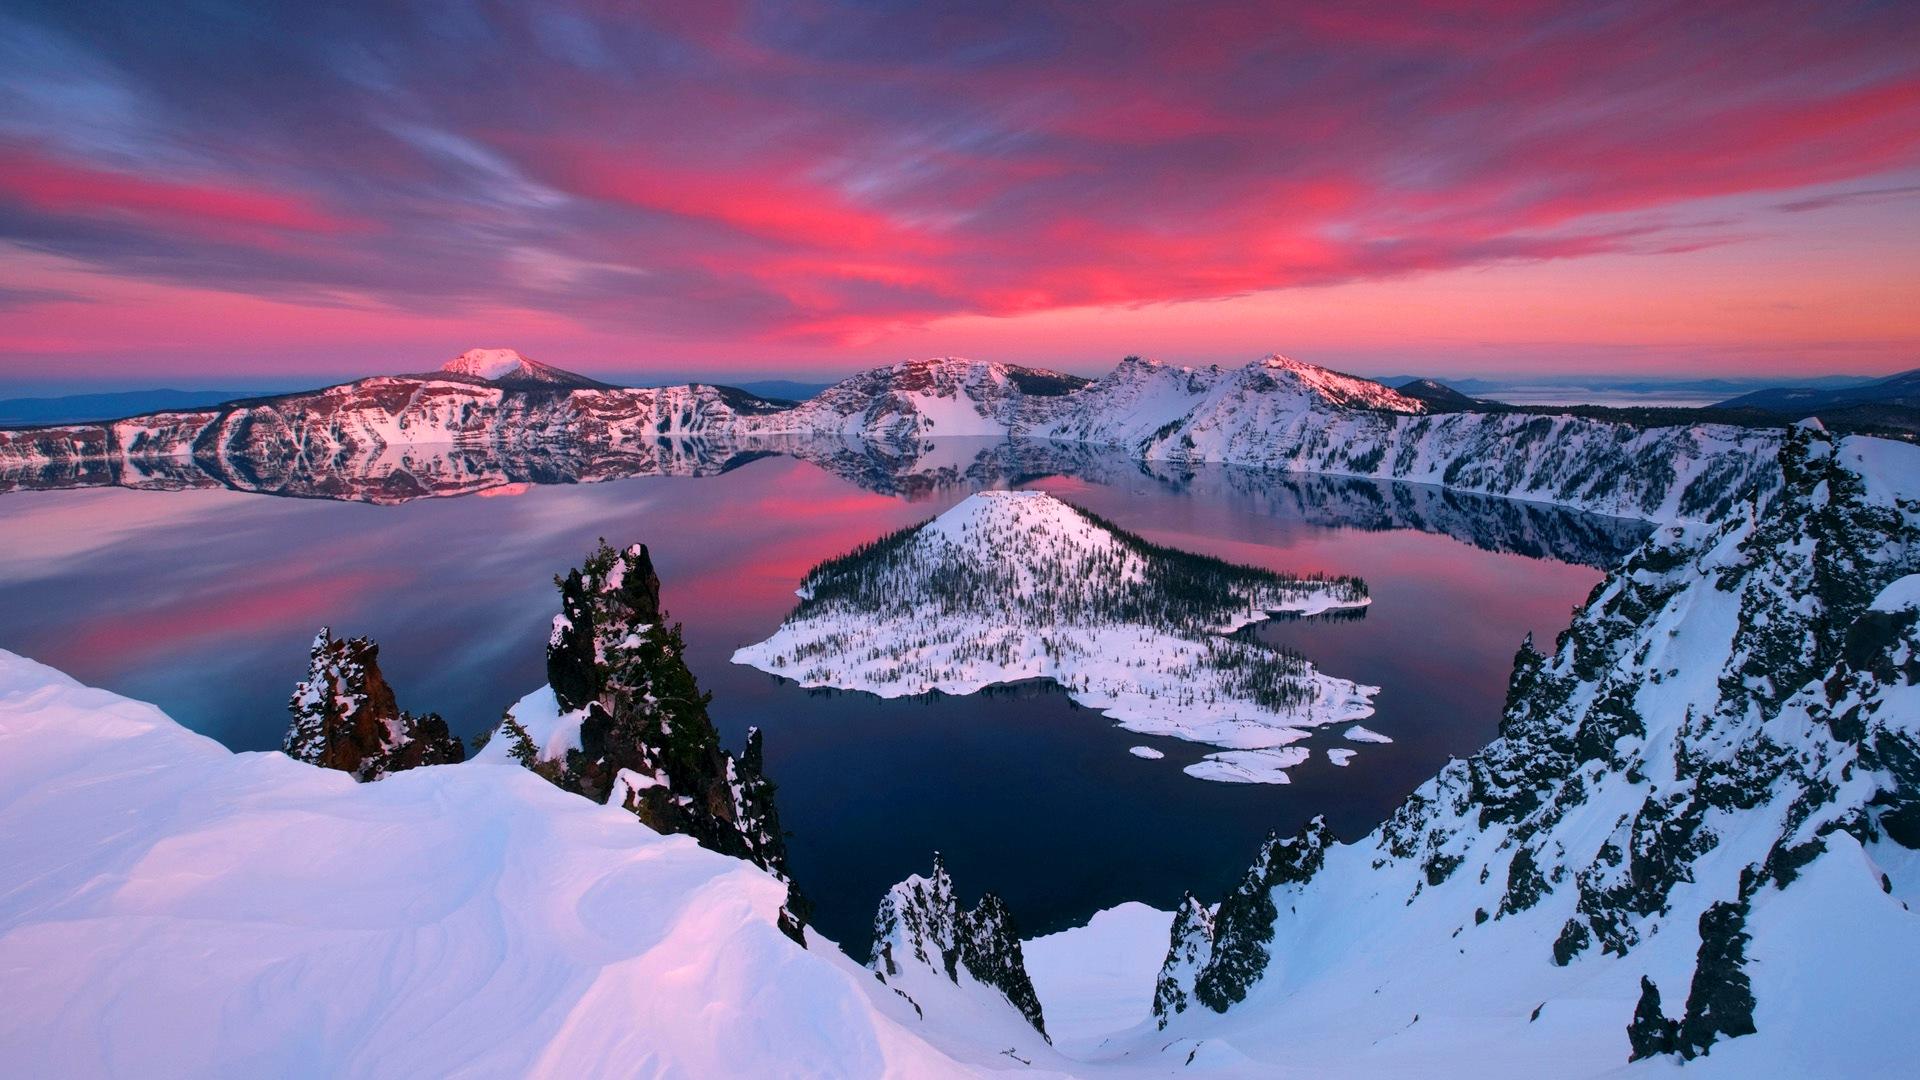 crater_lake_national_park